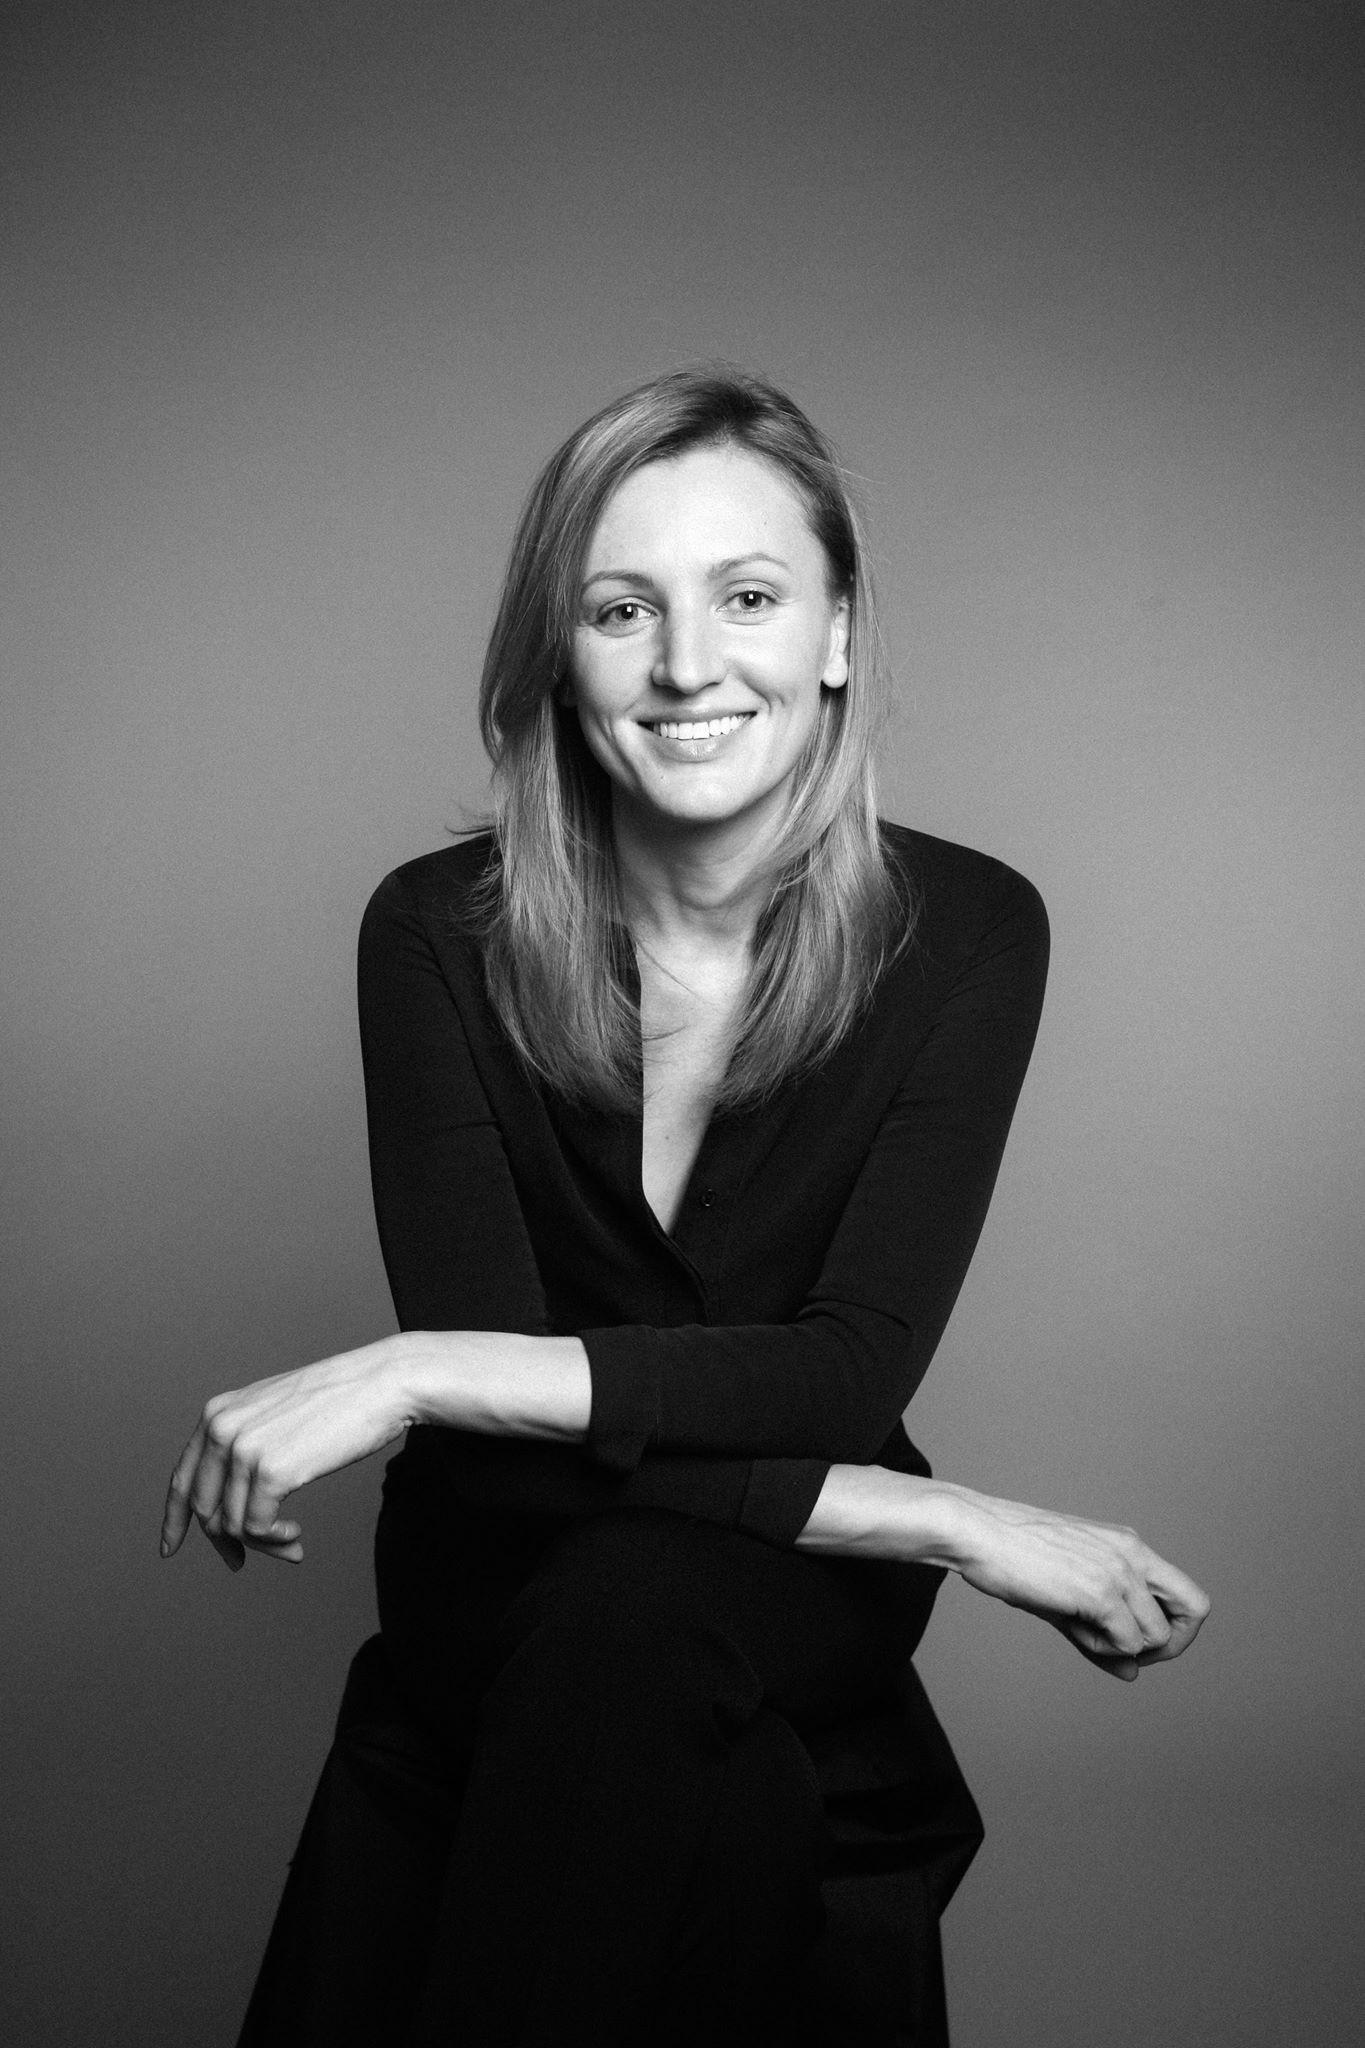 Наталья Симоненко